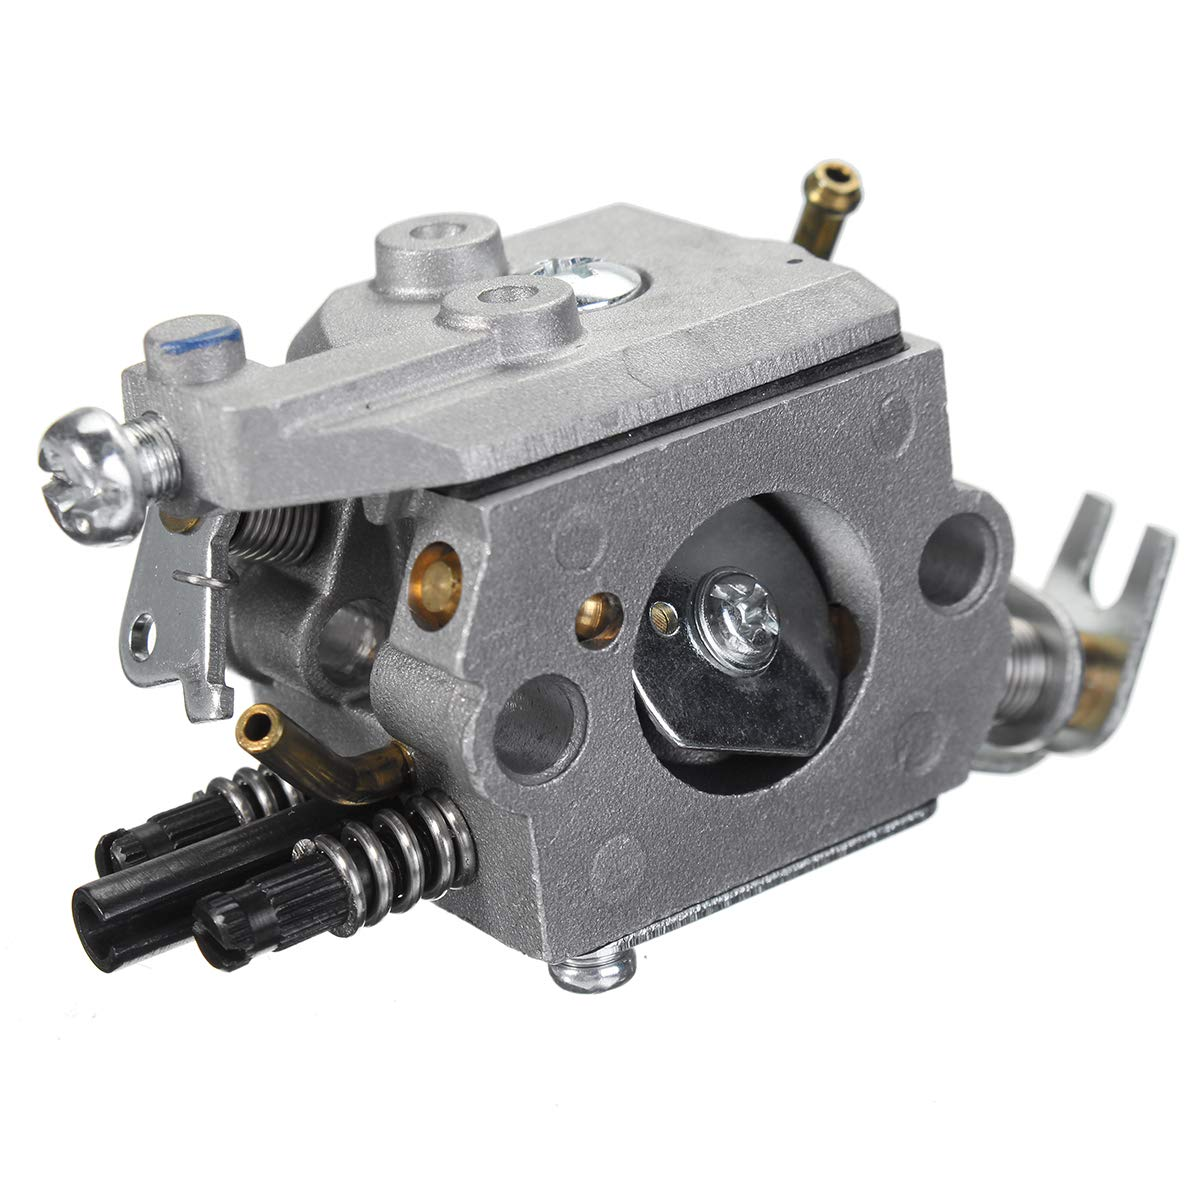 DADEQISH Carburador Carb para Husqvarna 322C 322L 323C 323L ...